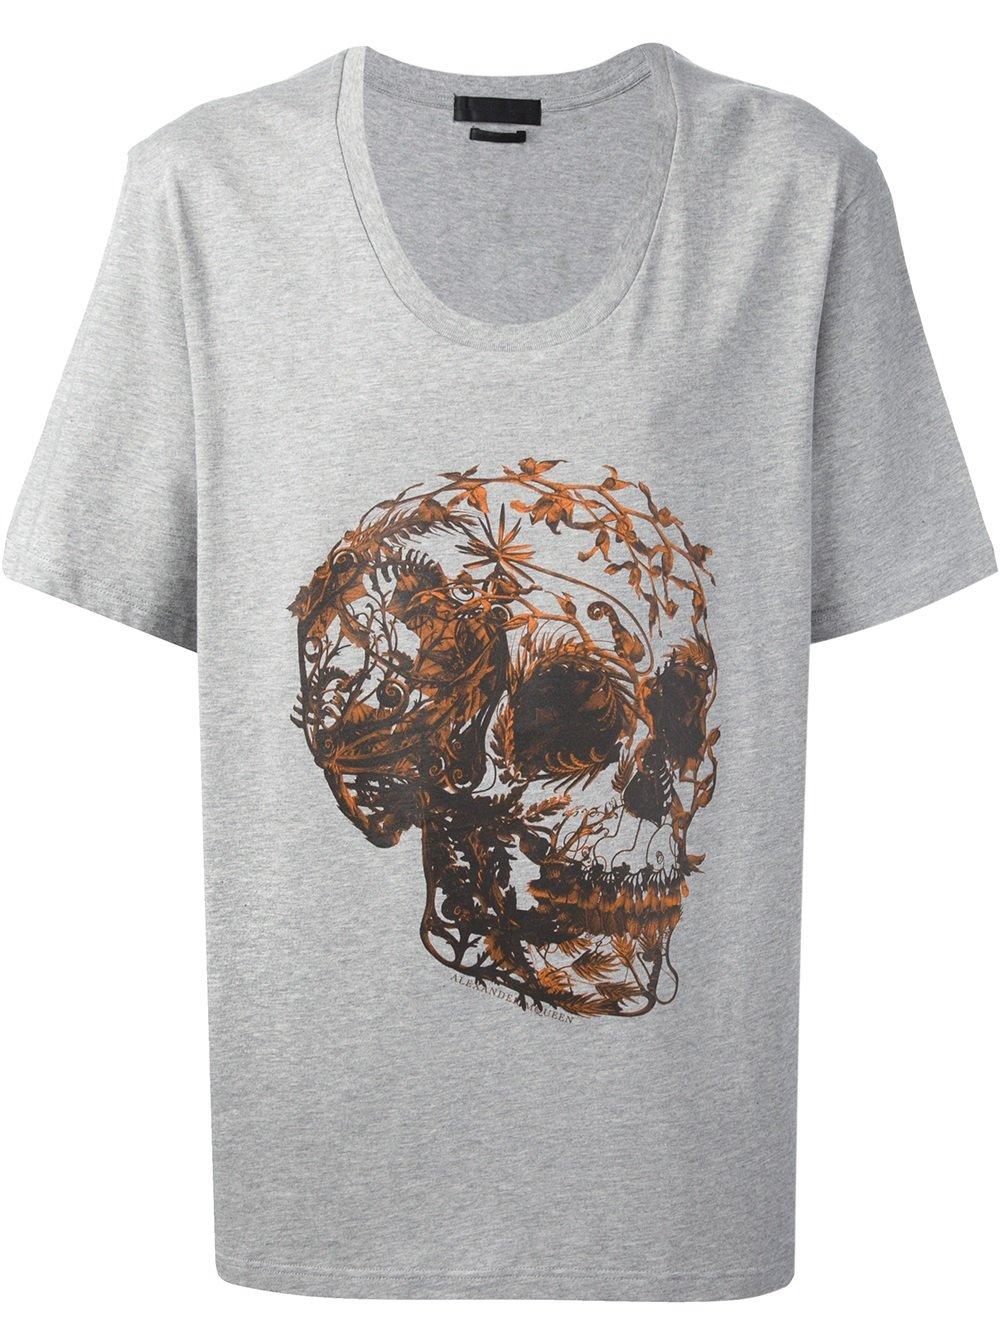 Lyst alexander mcqueen foliage skull print t shirt in for Alexander mcqueen shirt men